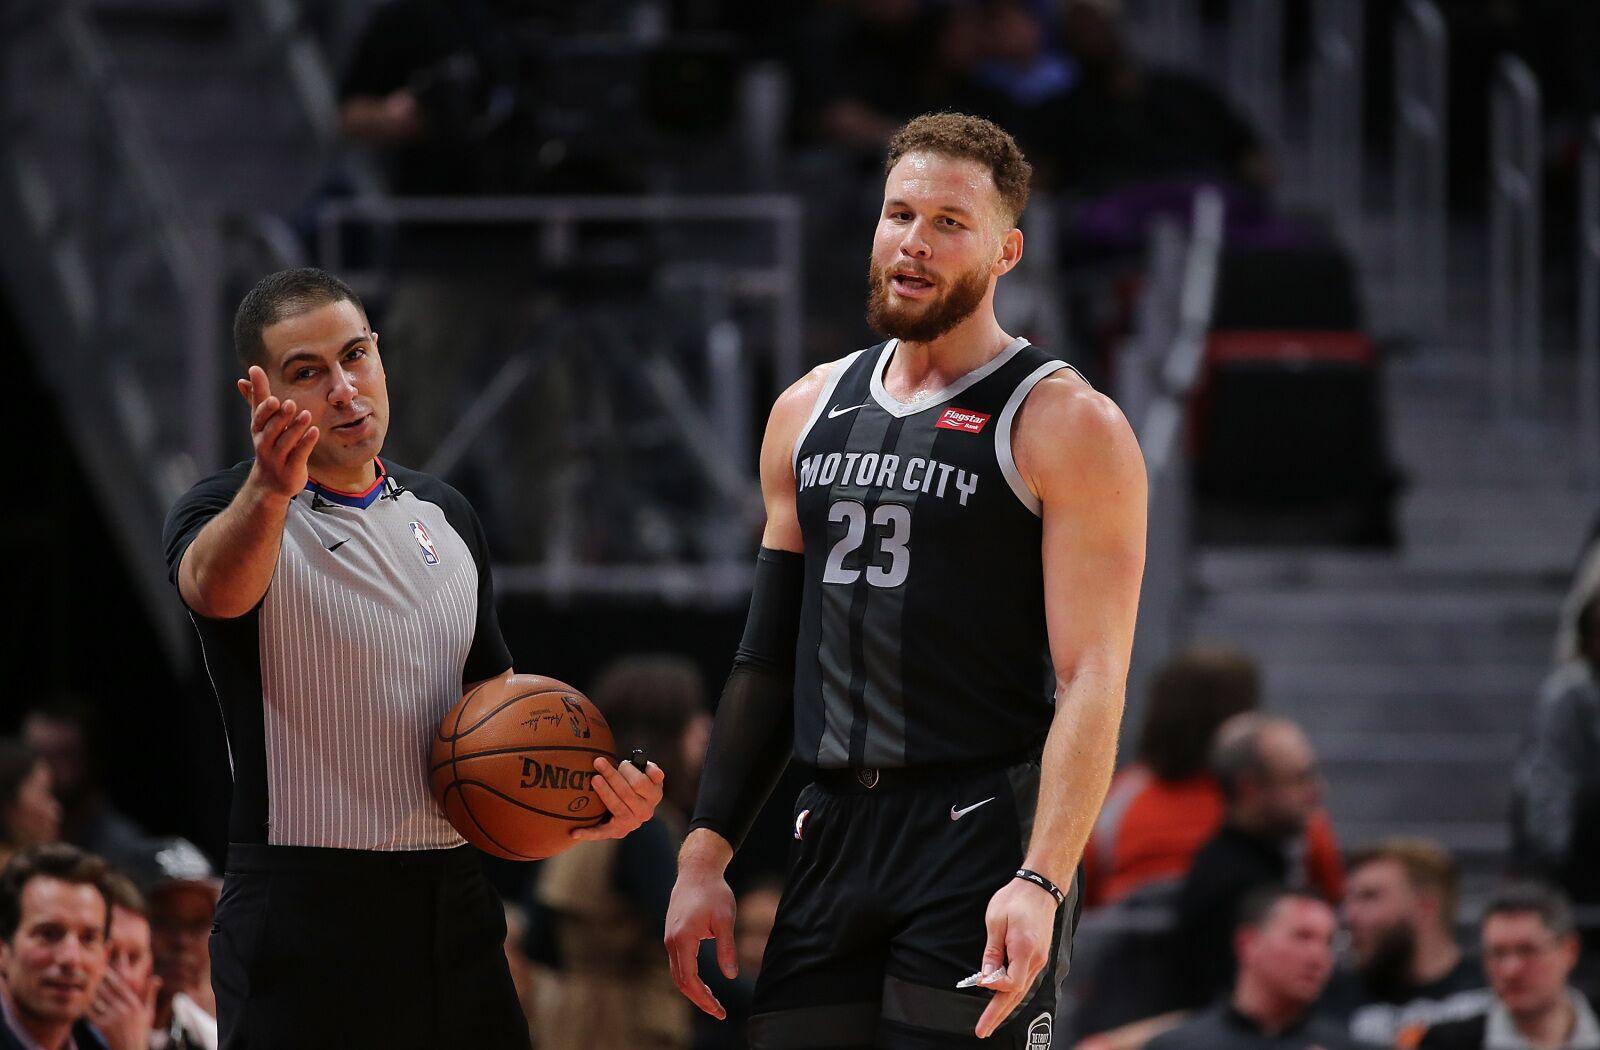 Detroit Pistons: Blake Griffin keeping team afloat